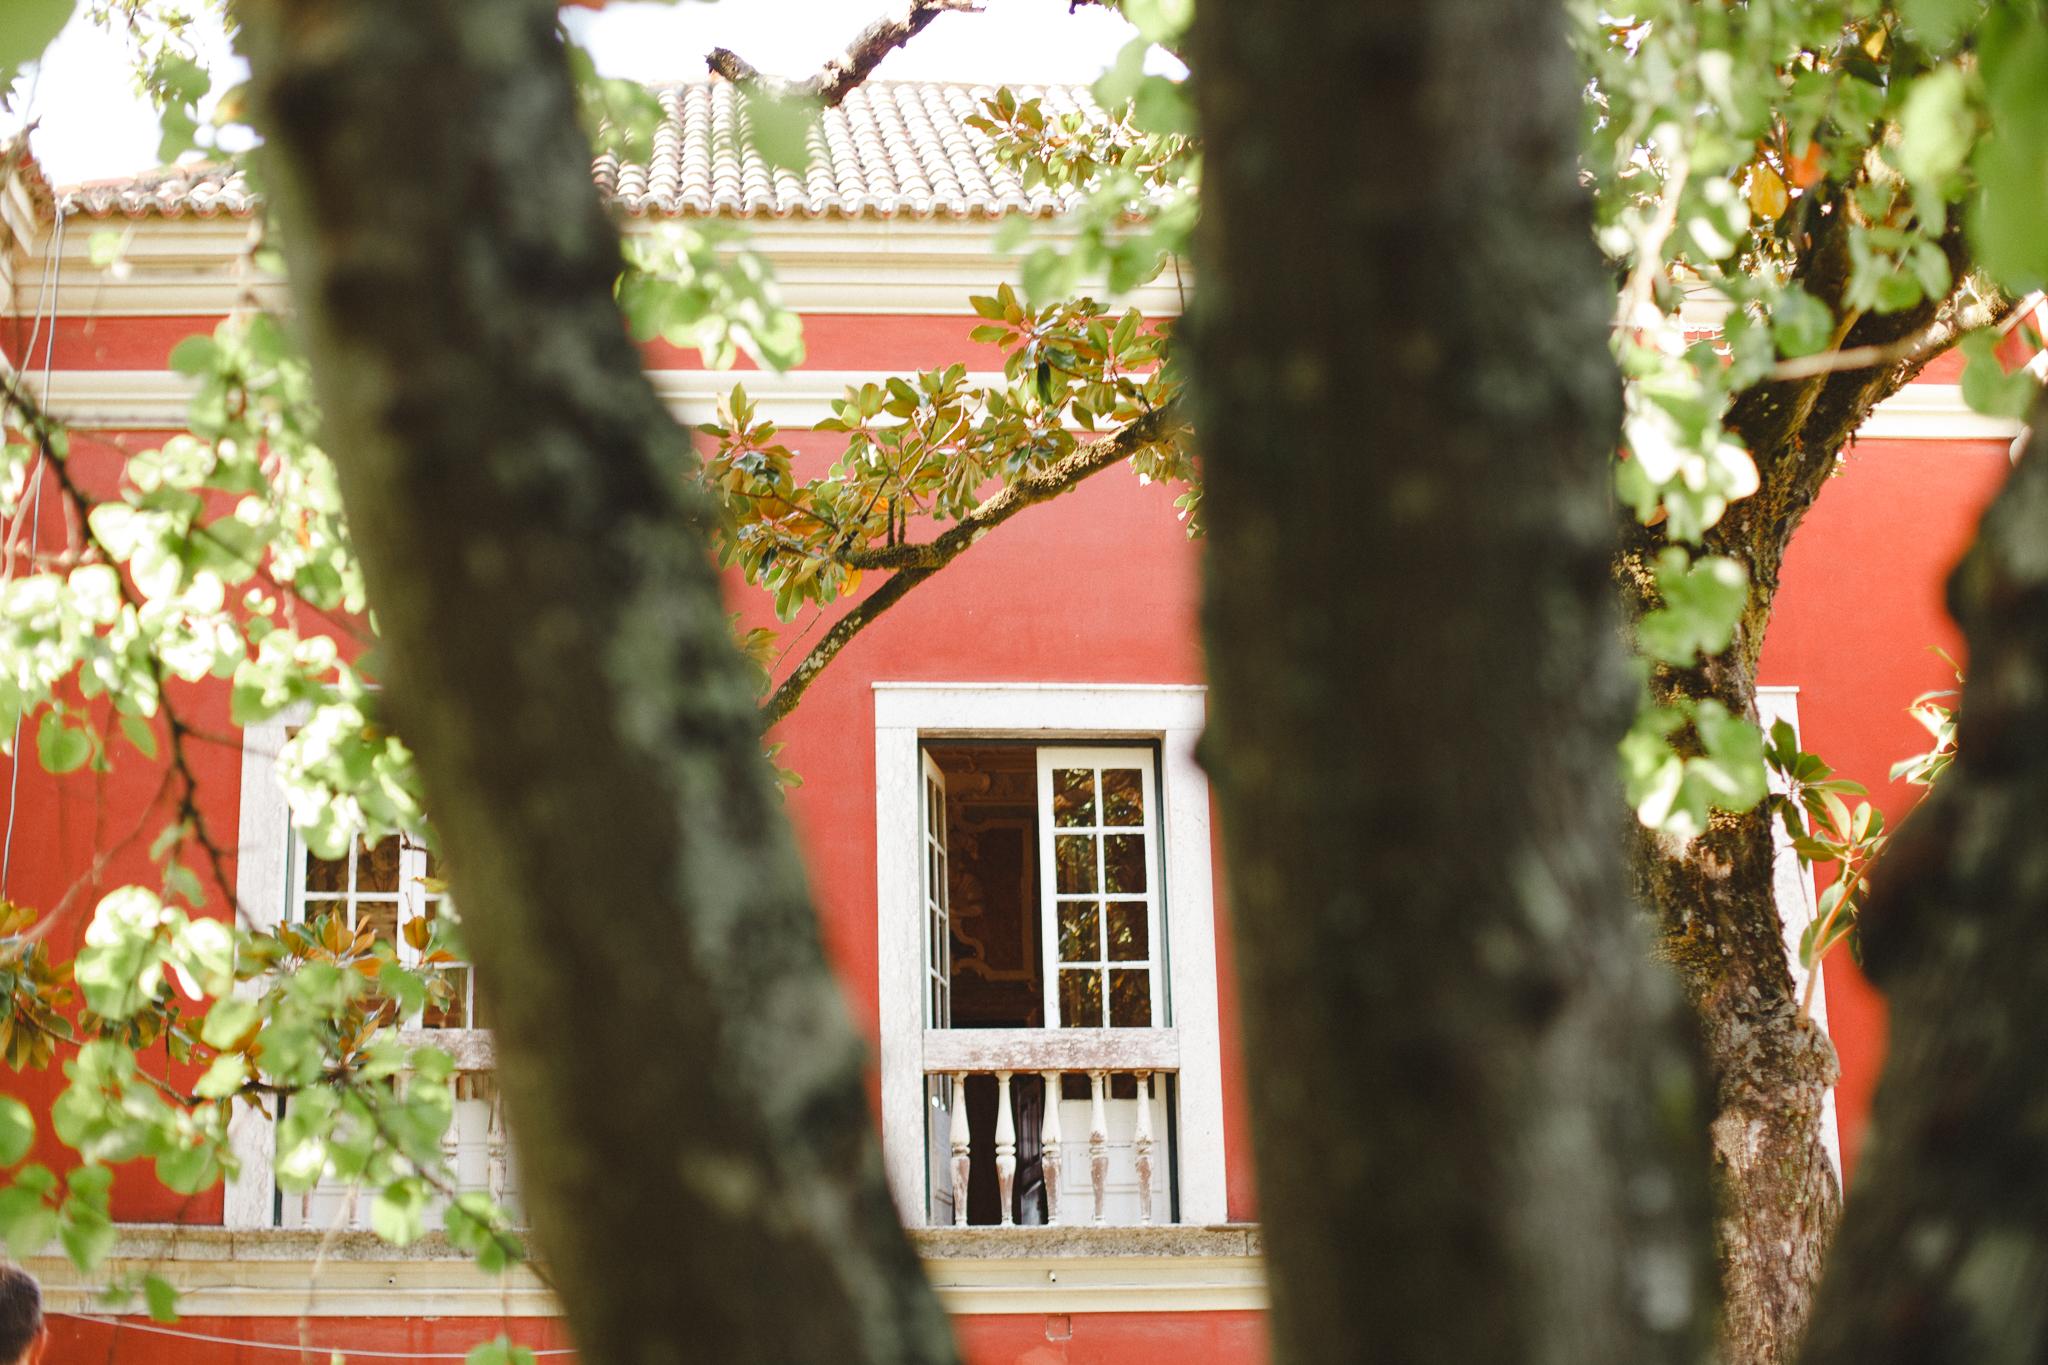 Palácio Marqueses da Fronteira Wedding Photography, Destination Wedding Portugal, Wedding Photography Hello Twiggs